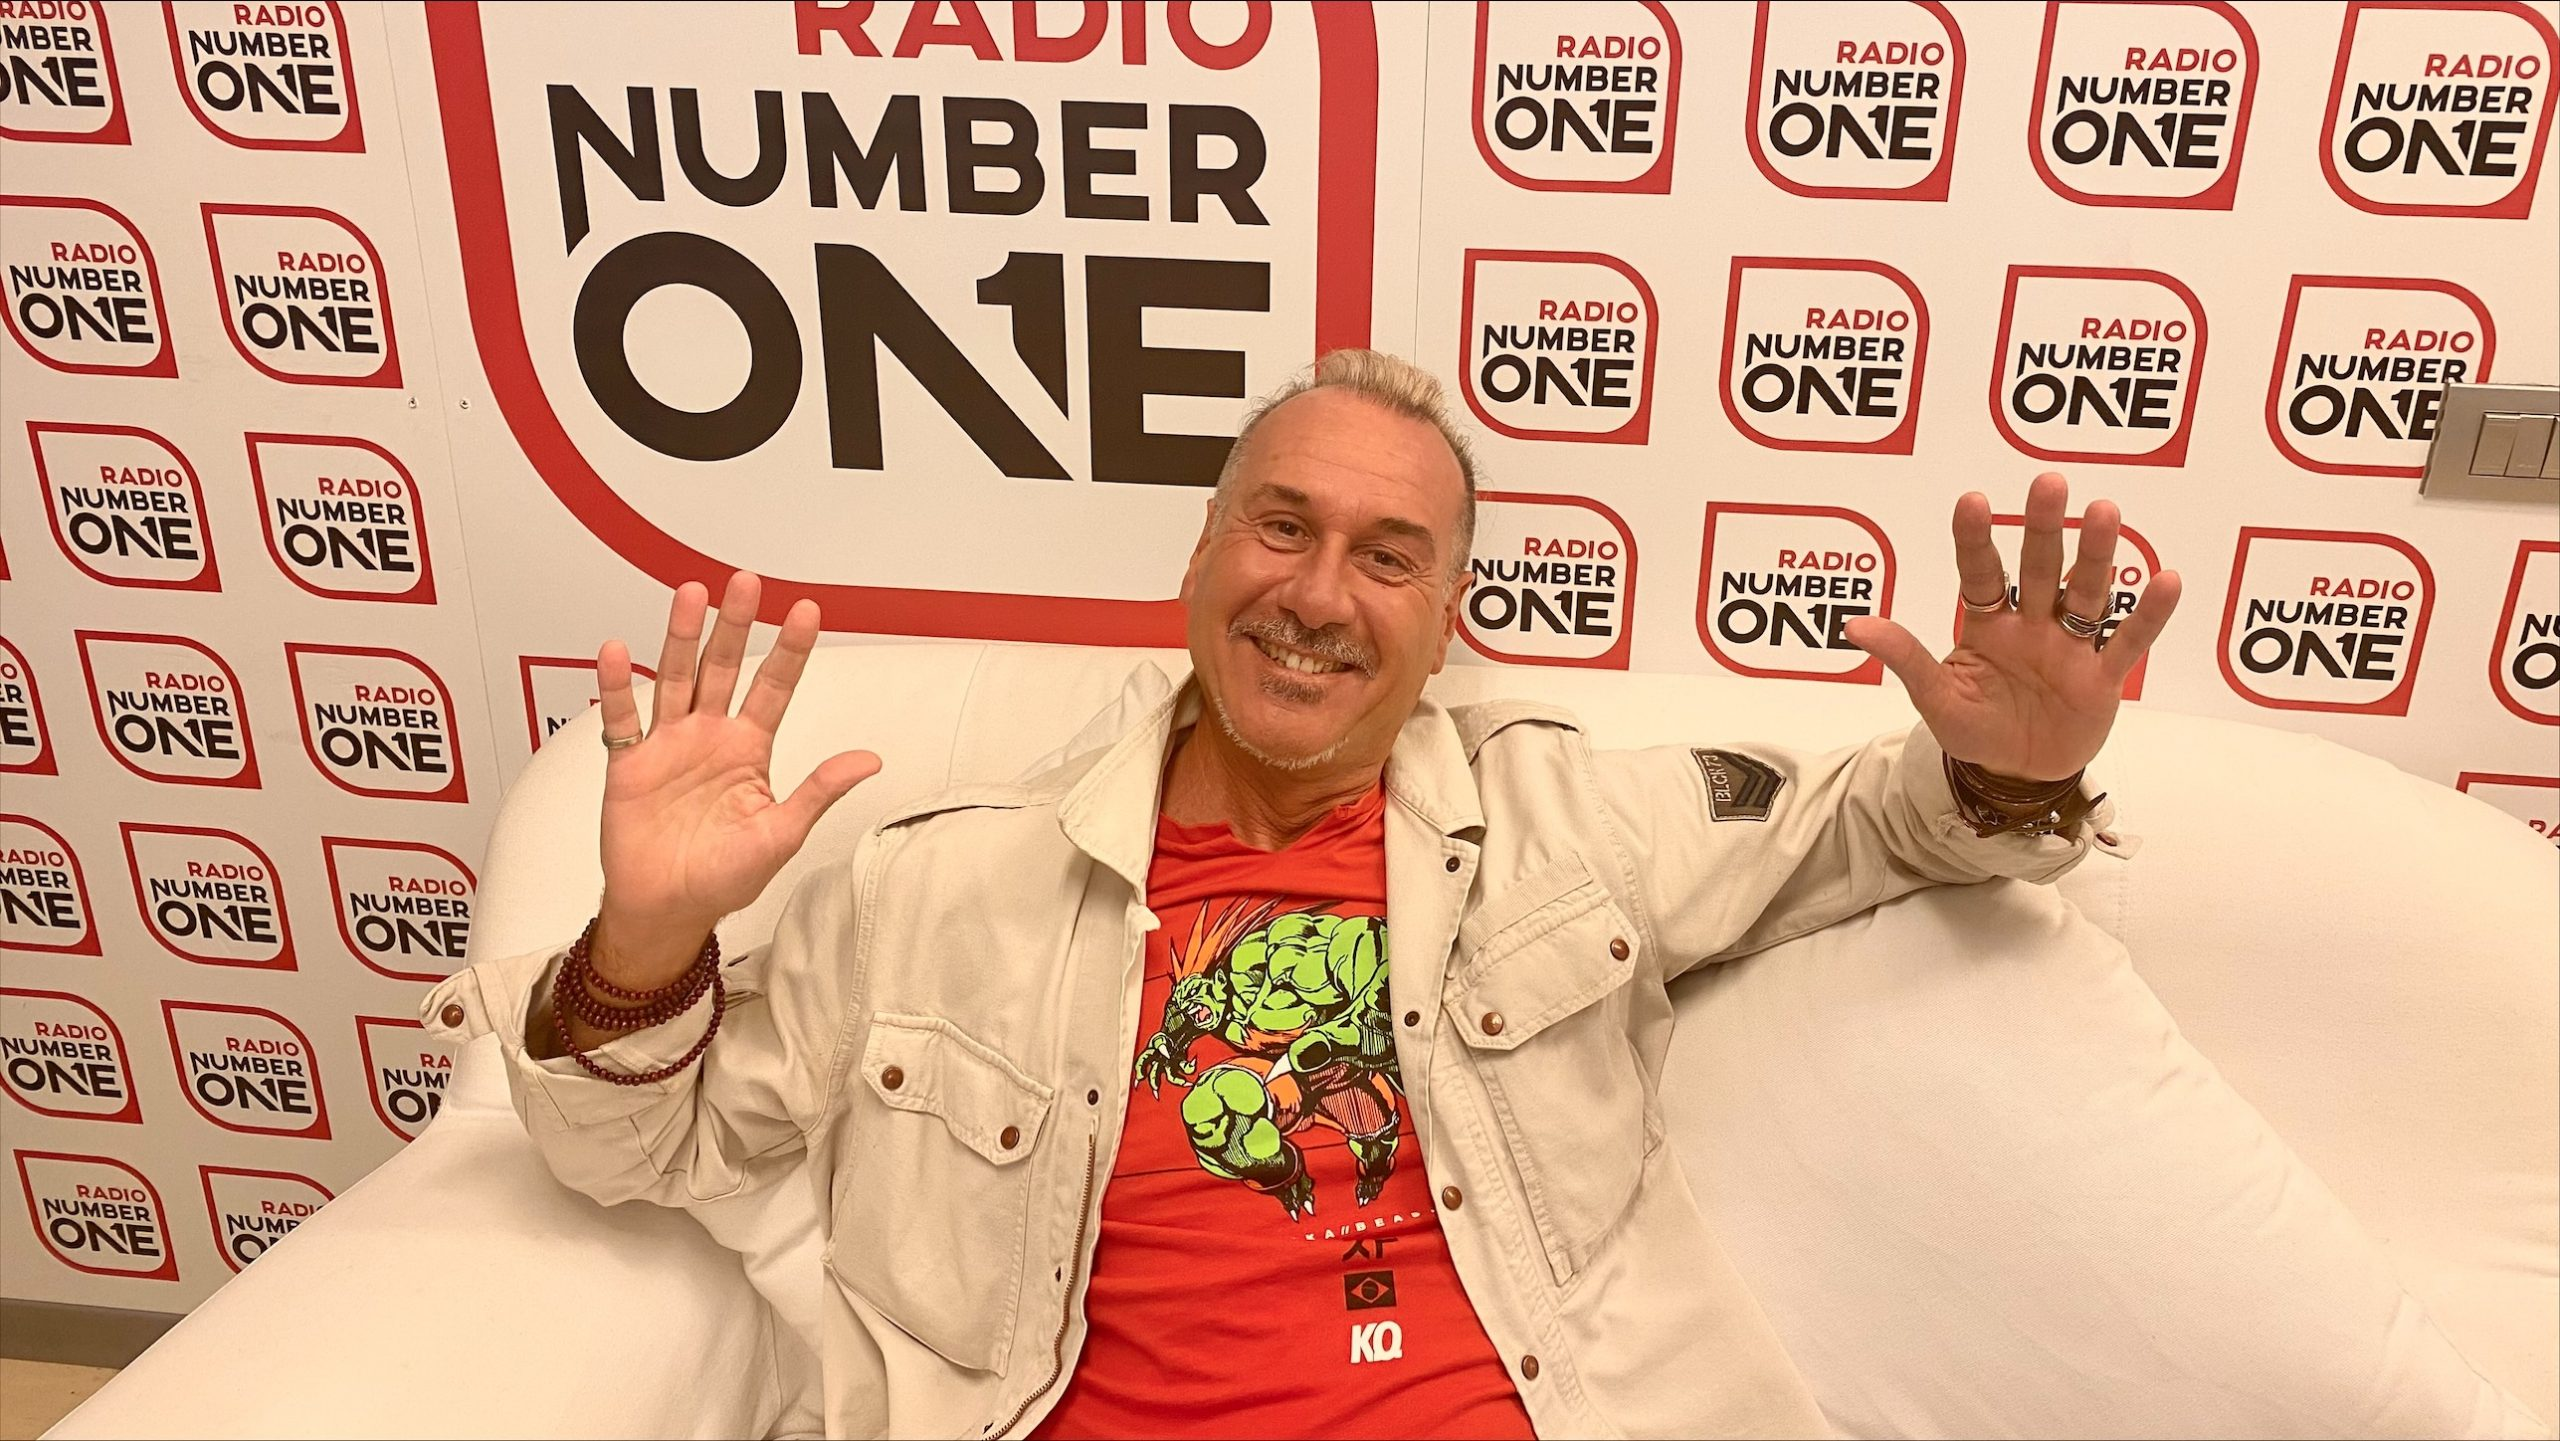 Lukino nel weekend di Radio Number One: ogni sabato, dalle 14 alle 17